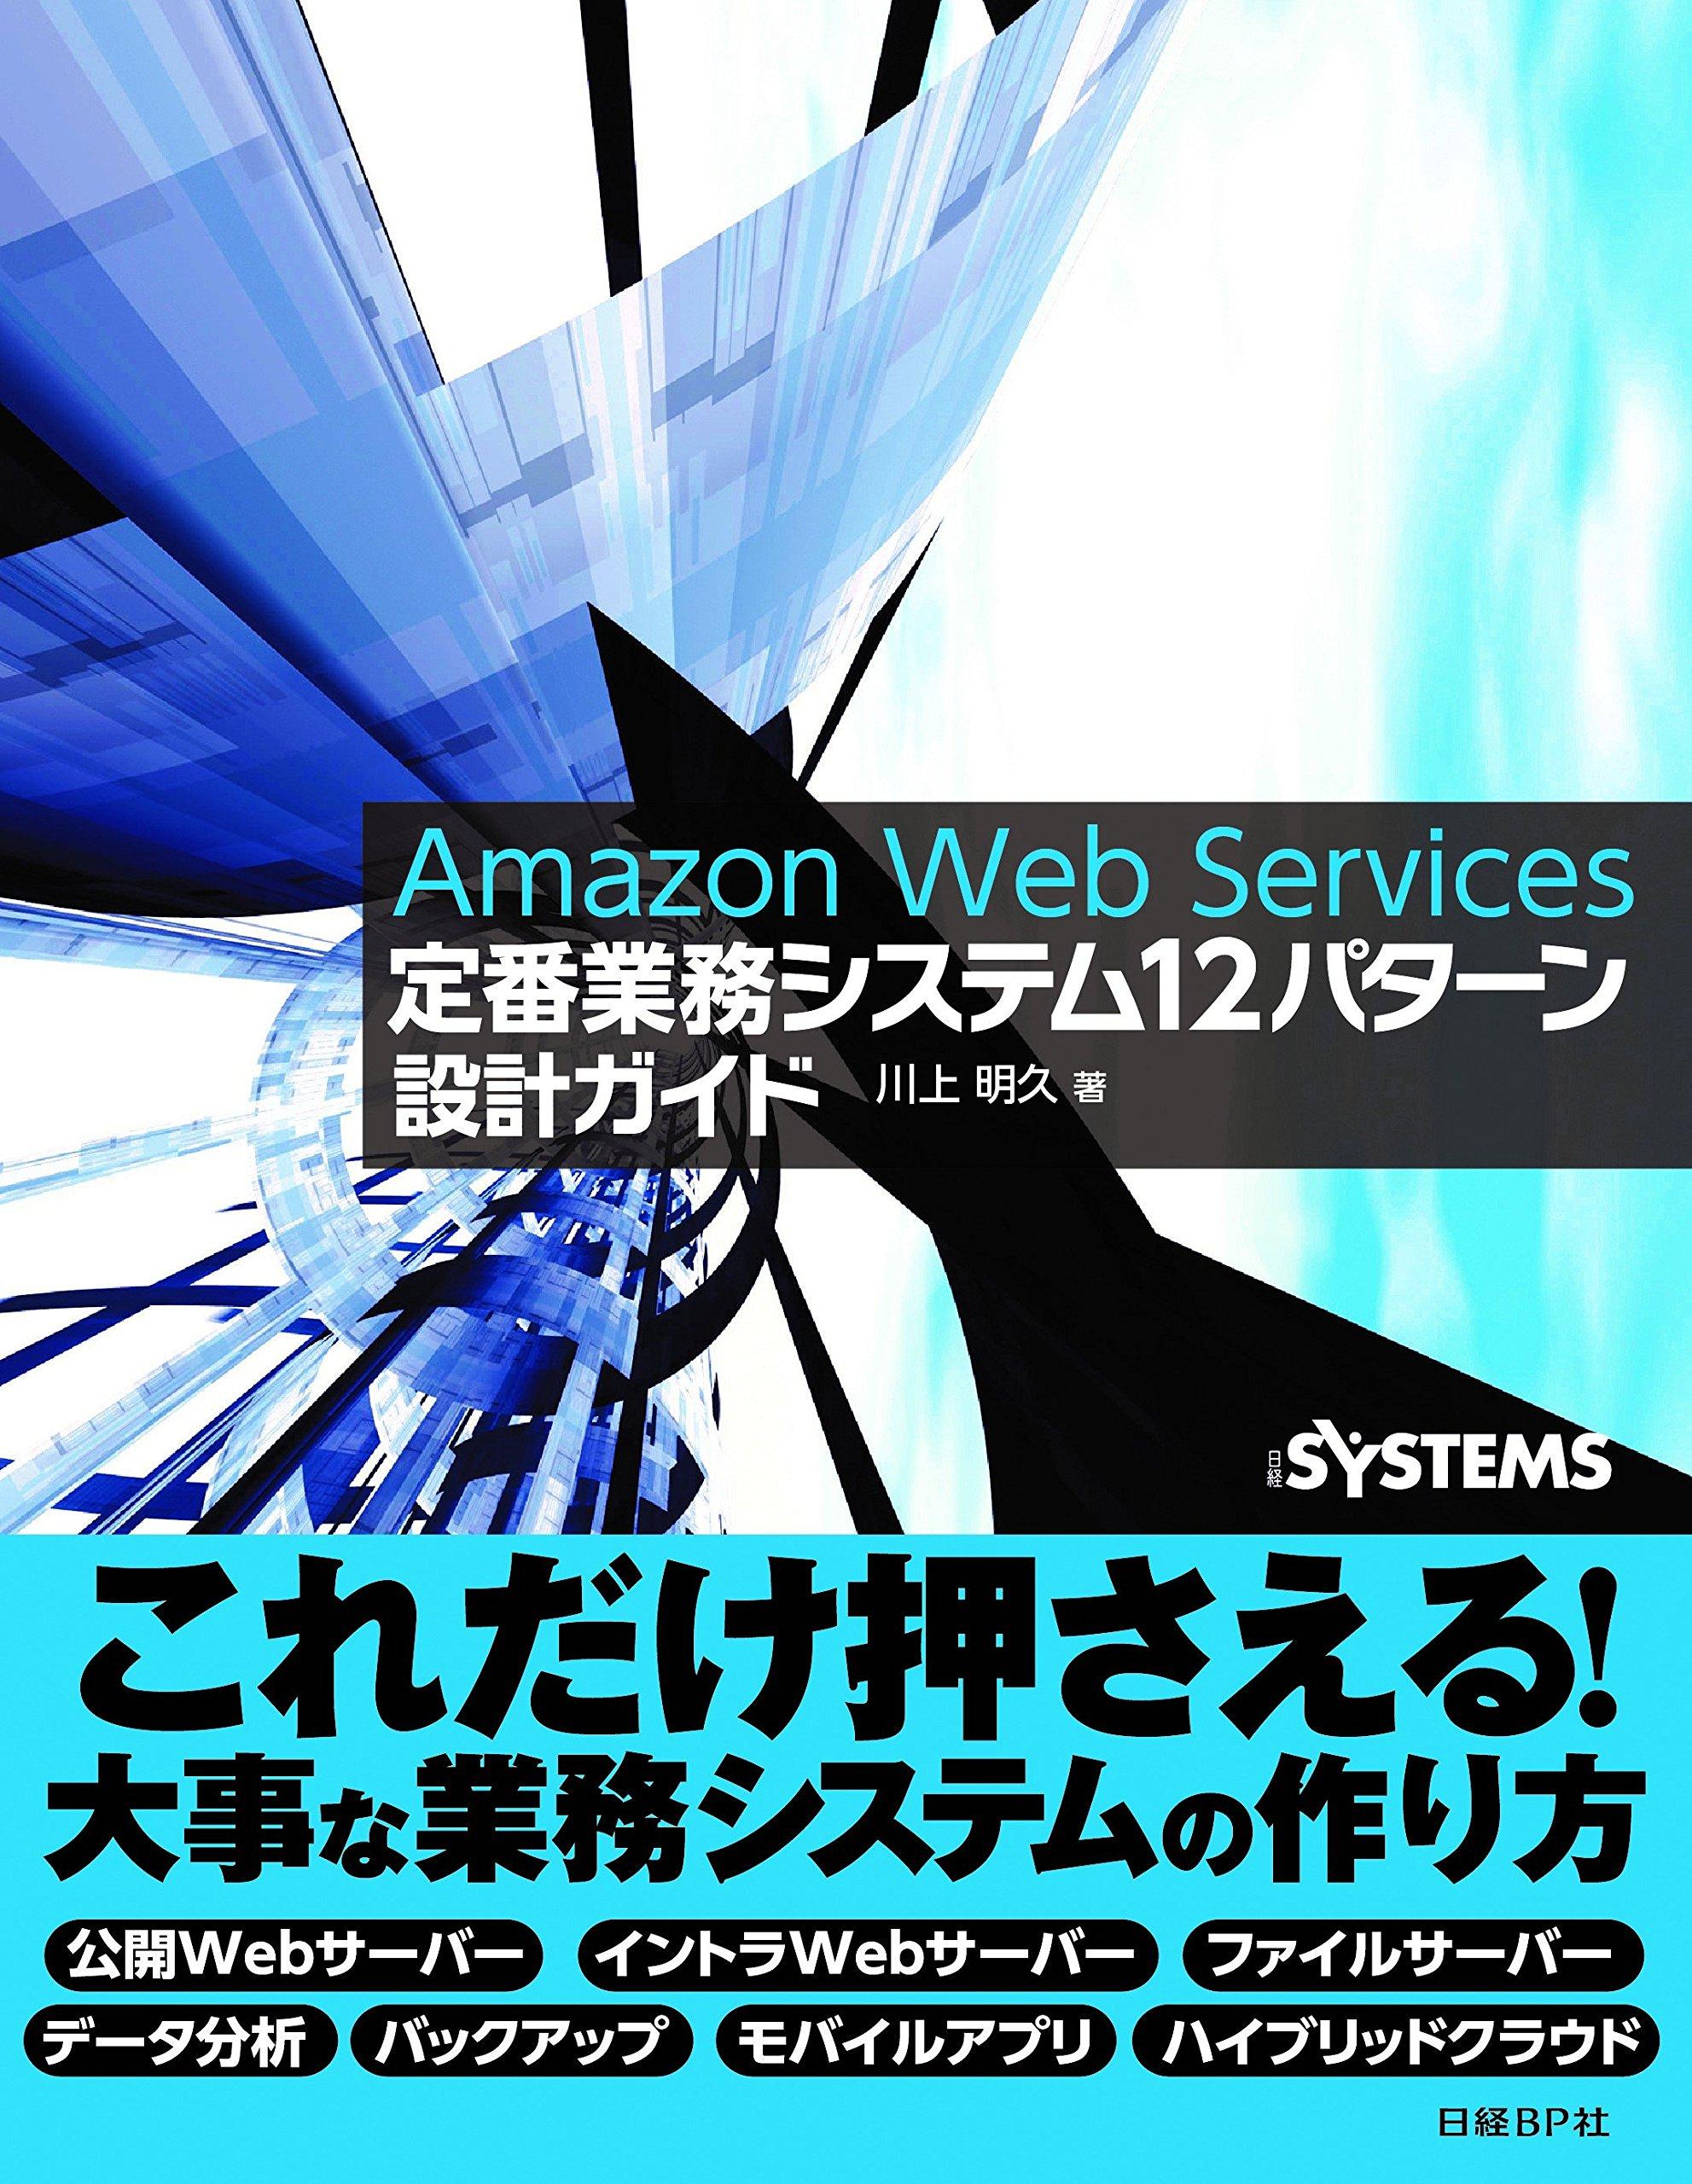 amazon web services 定番業務システム12パターン 設計ガイド 川上